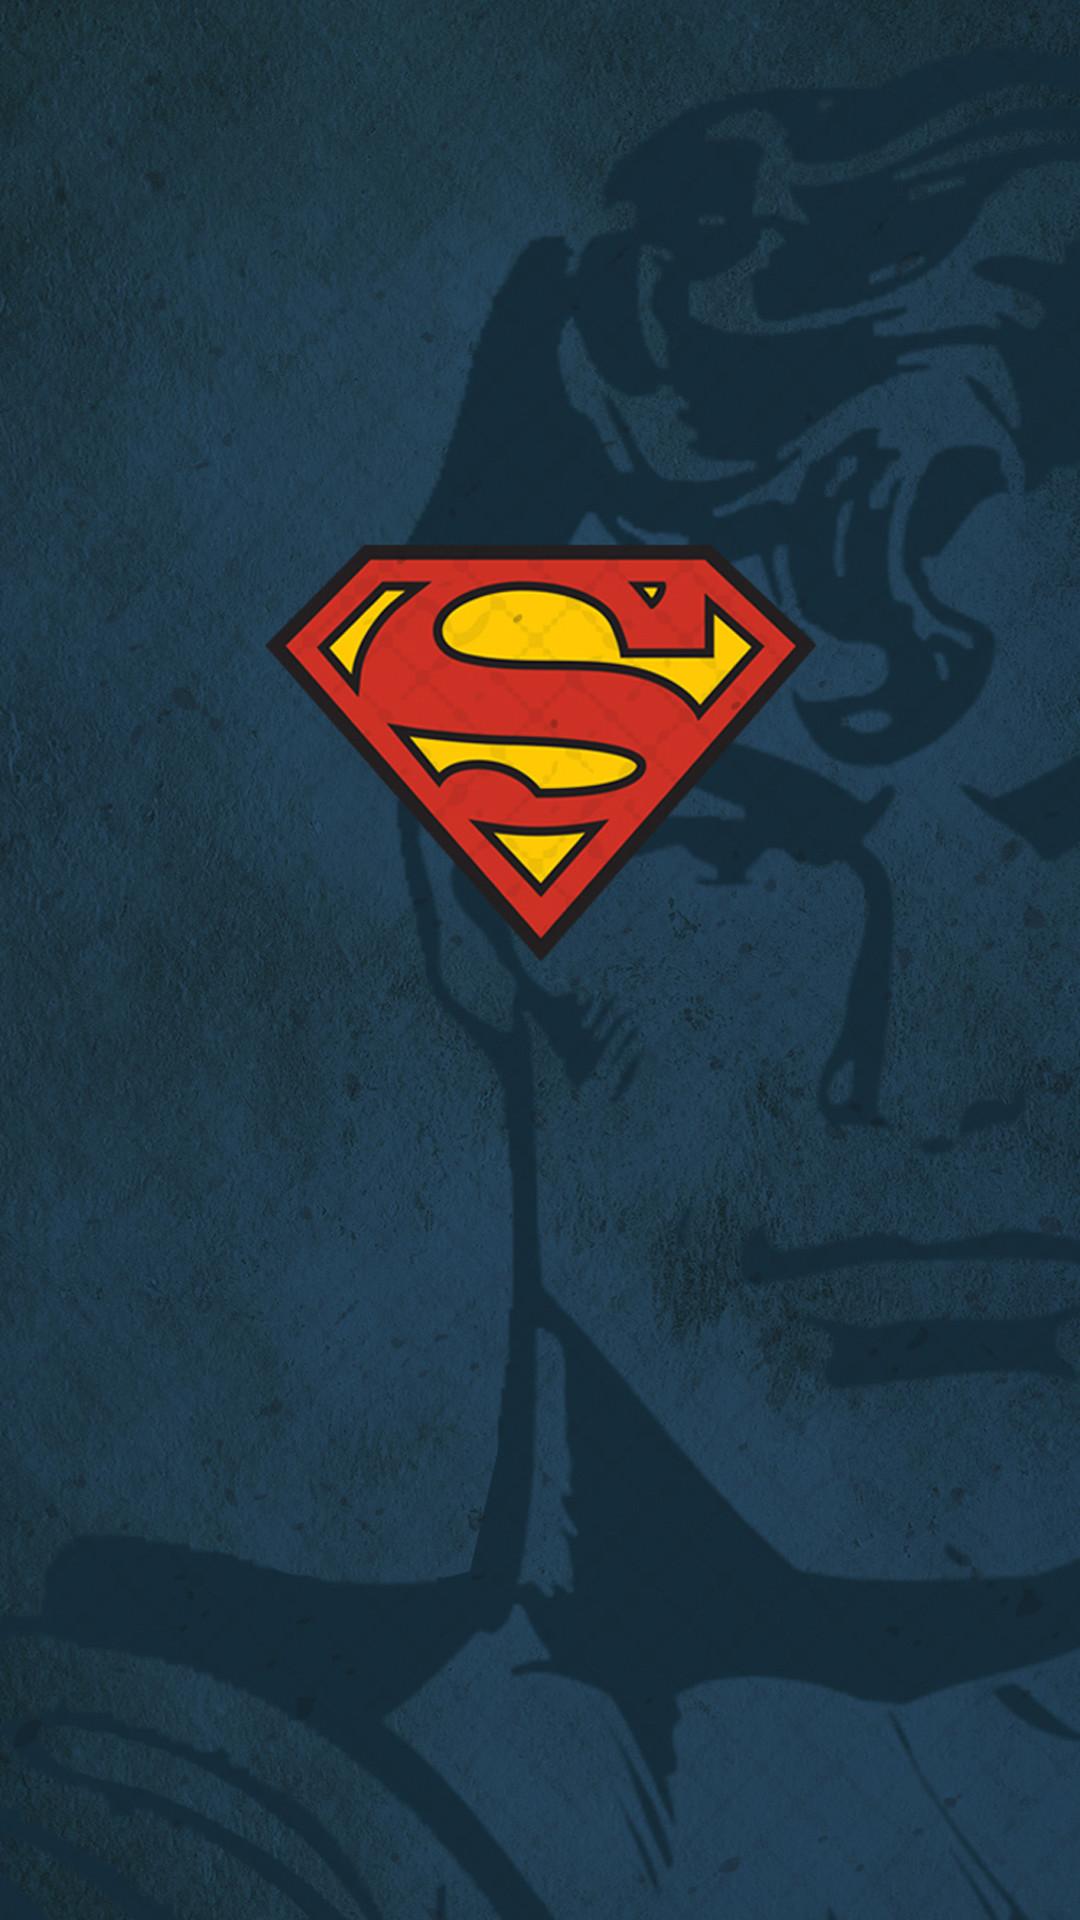 Superman 01 – iPhone 6 Plus. Superman SymbolSuperman ComicSuperman LogoBatmanSuperman  WallpaperIphone BackgroundsIphone WallpapersSupergirlWonder Woman